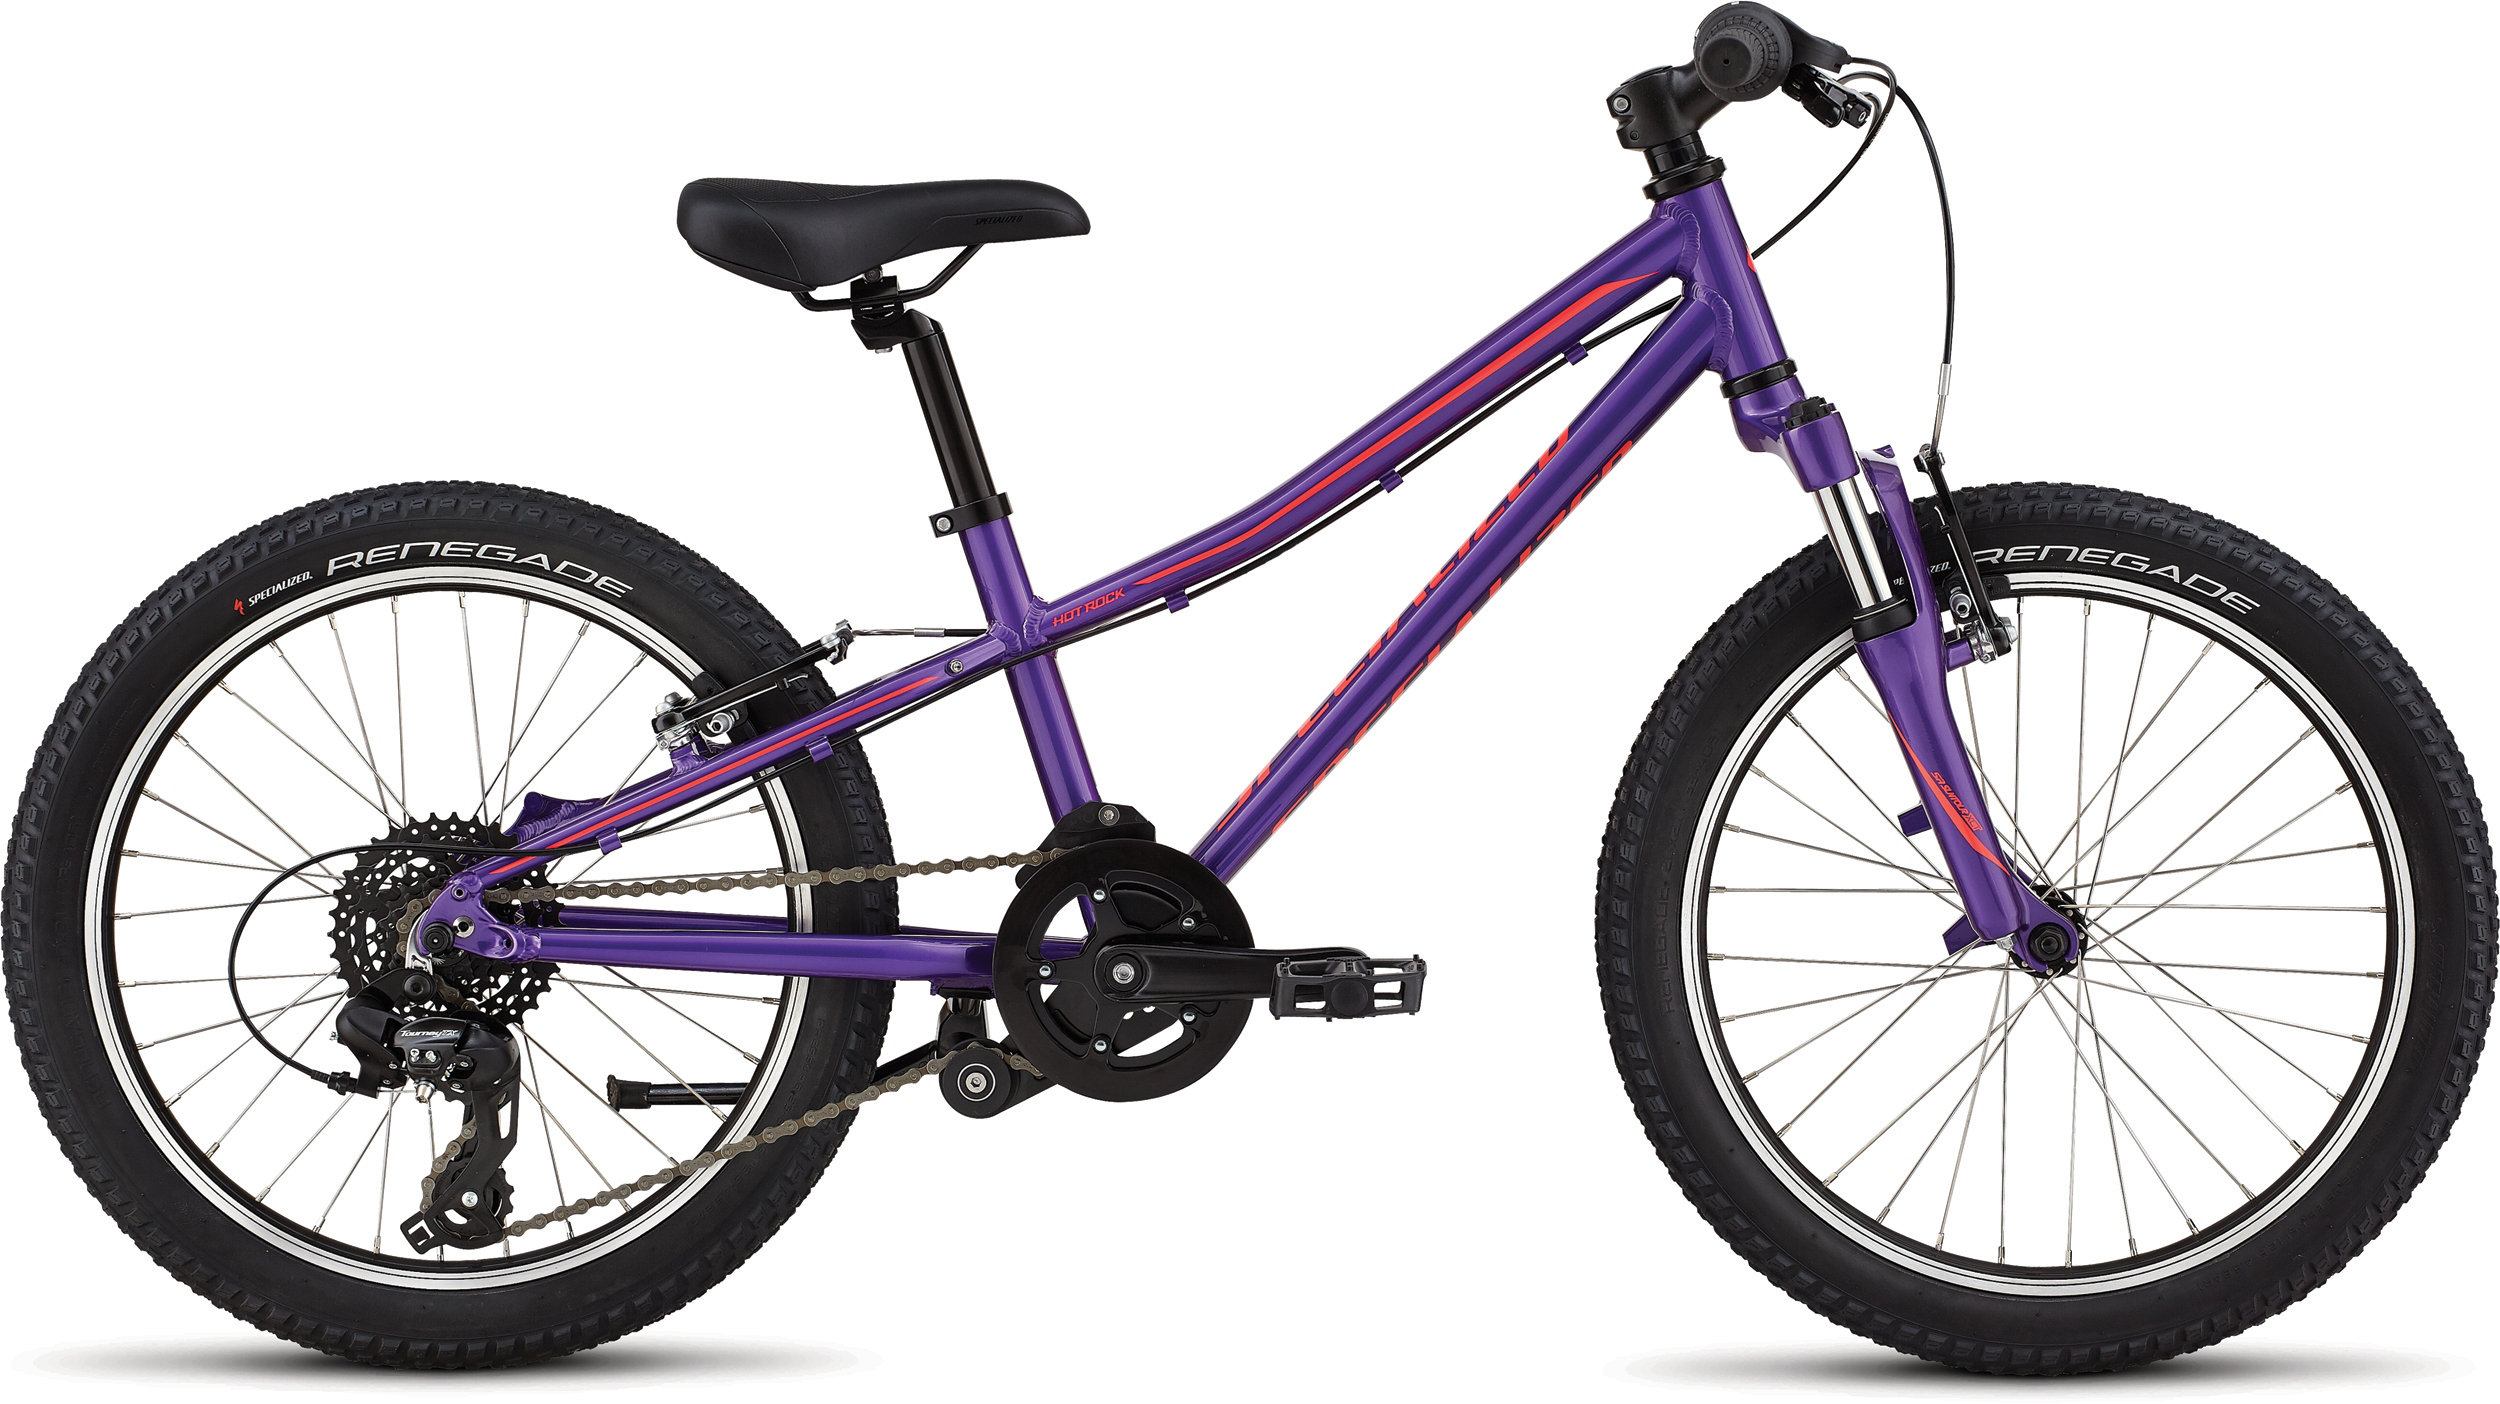 Specialized Hotrock 20 Purple Haze/Black/Acid Red 9 - Alpha Bikes